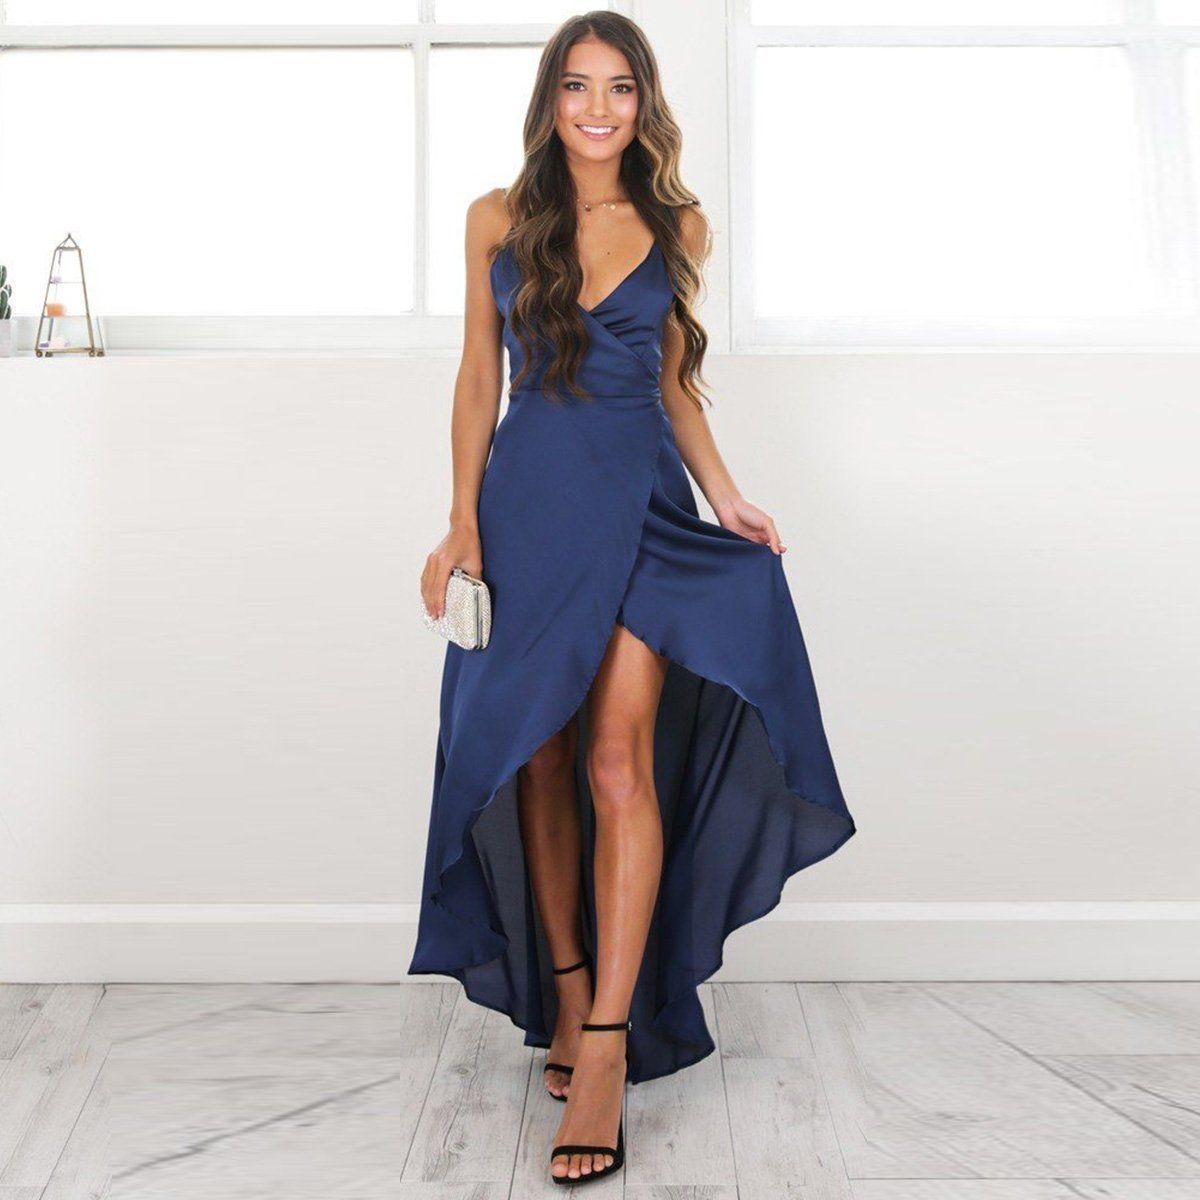 041756be5fc4 2019 Women Sexy Long Dress High Split Deep V Neck Strappy Vestidos Party  Maxi Boho Long Dress Beachwear Summer Split Sundress From Silan